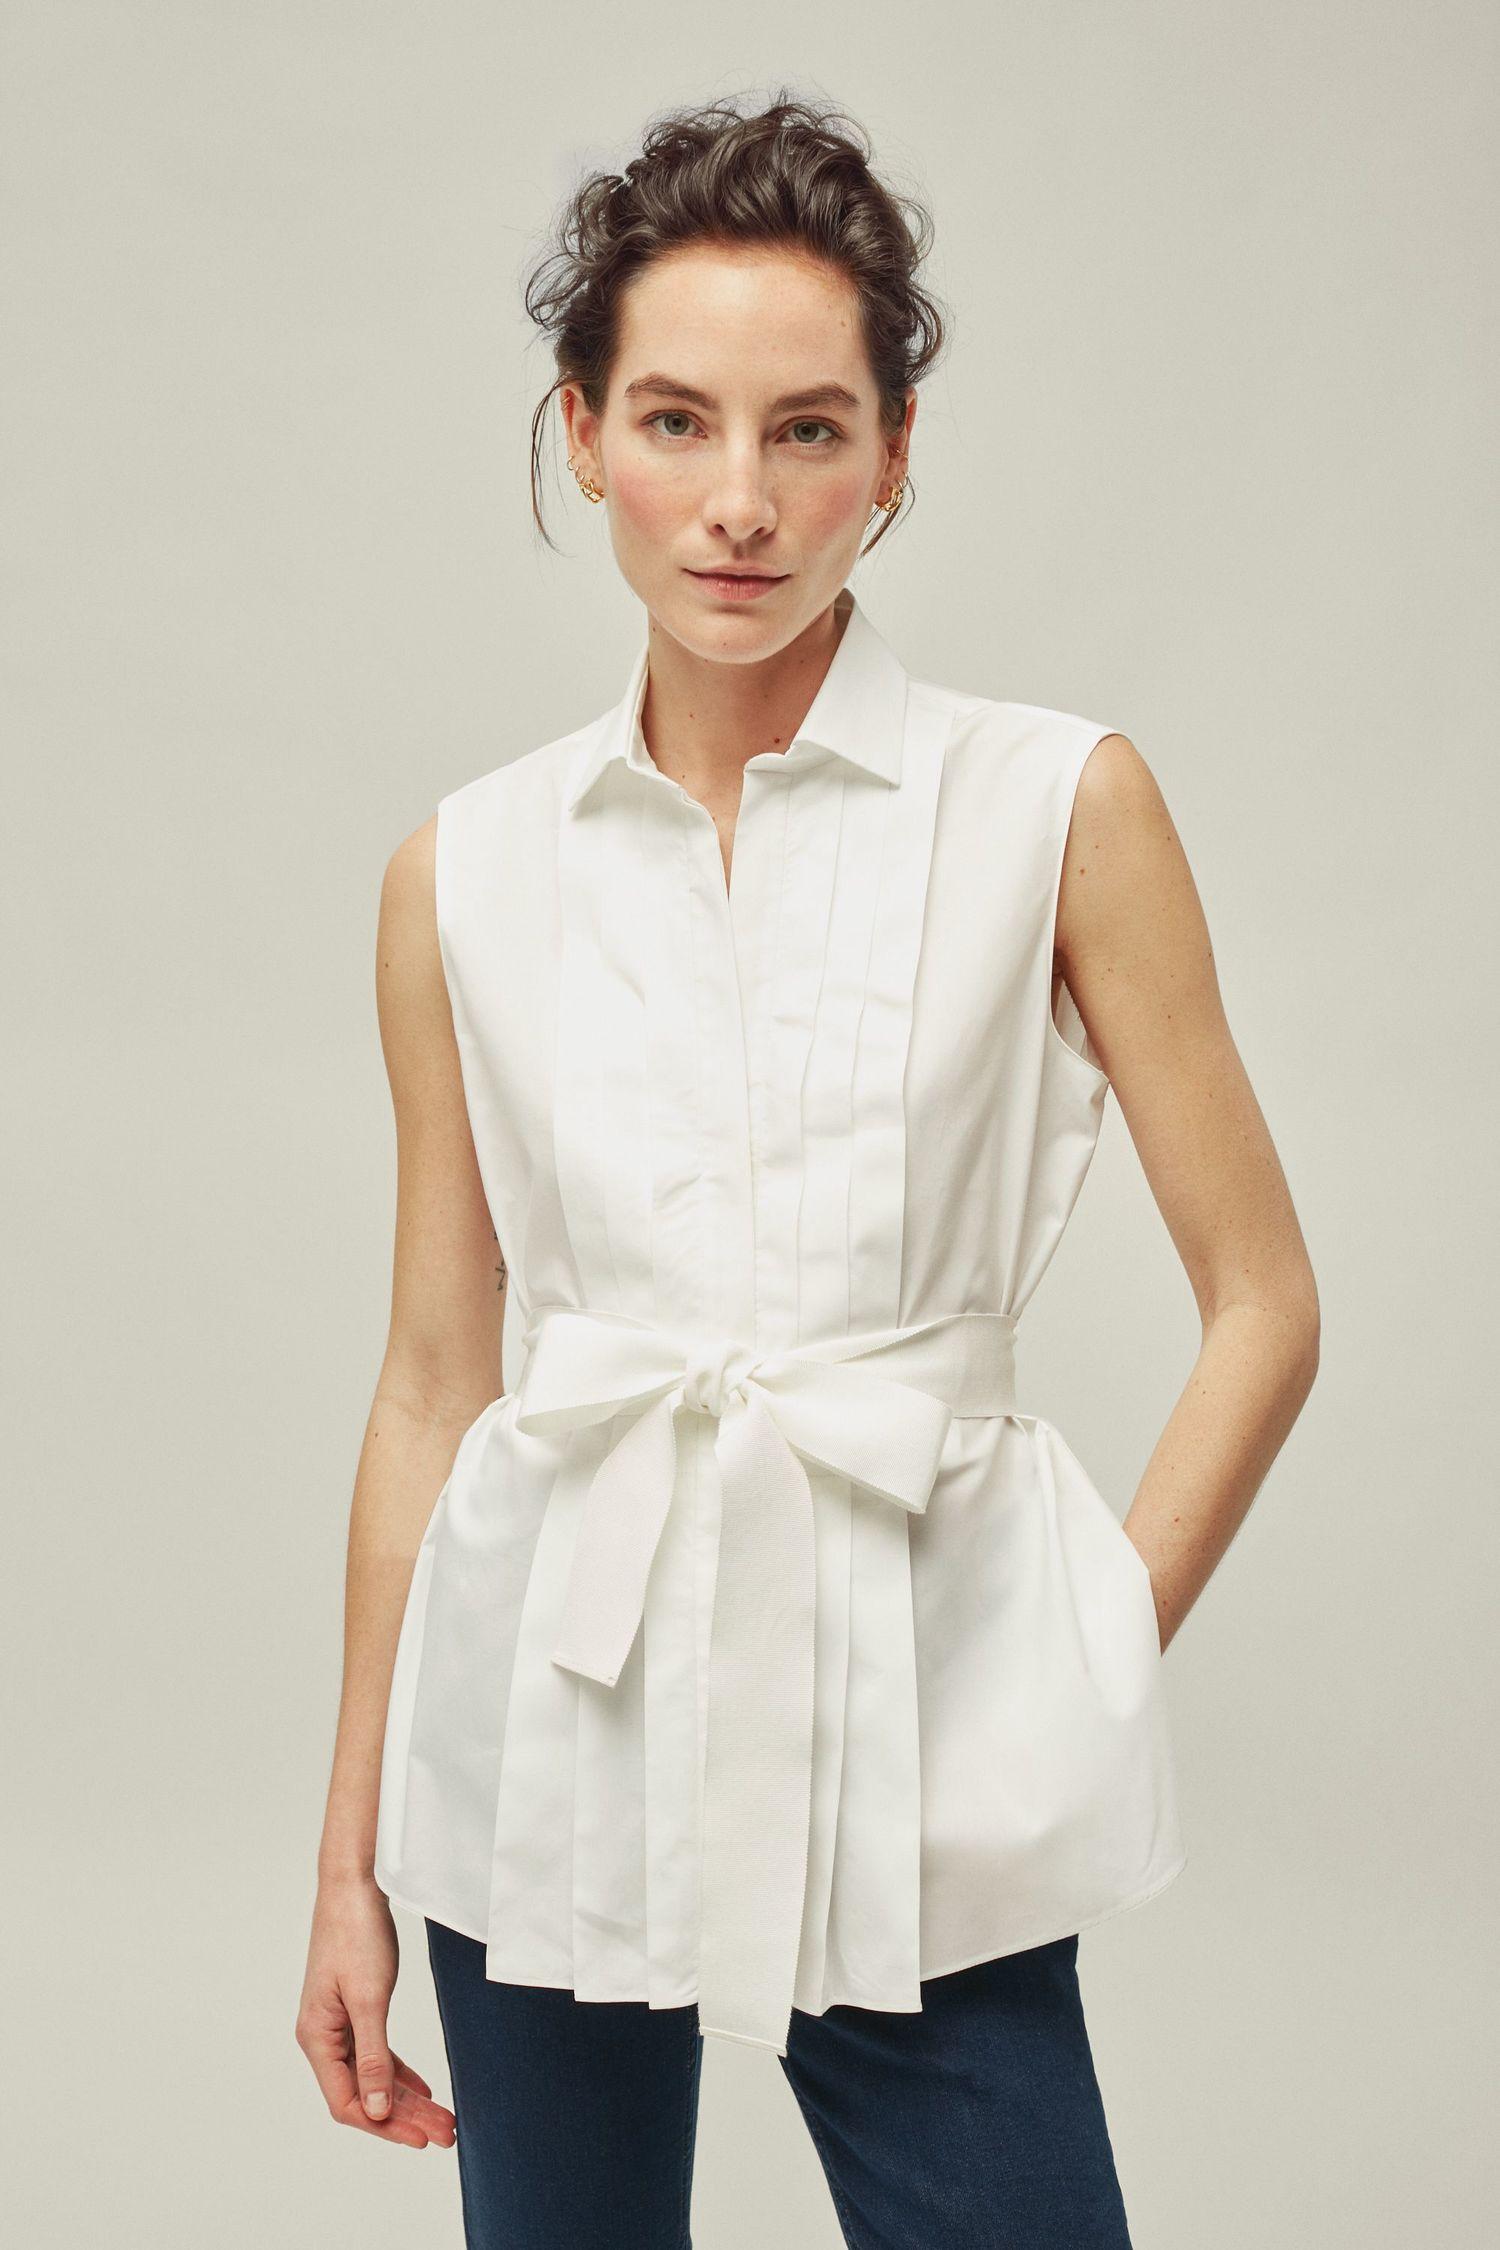 Pleated White Shirt